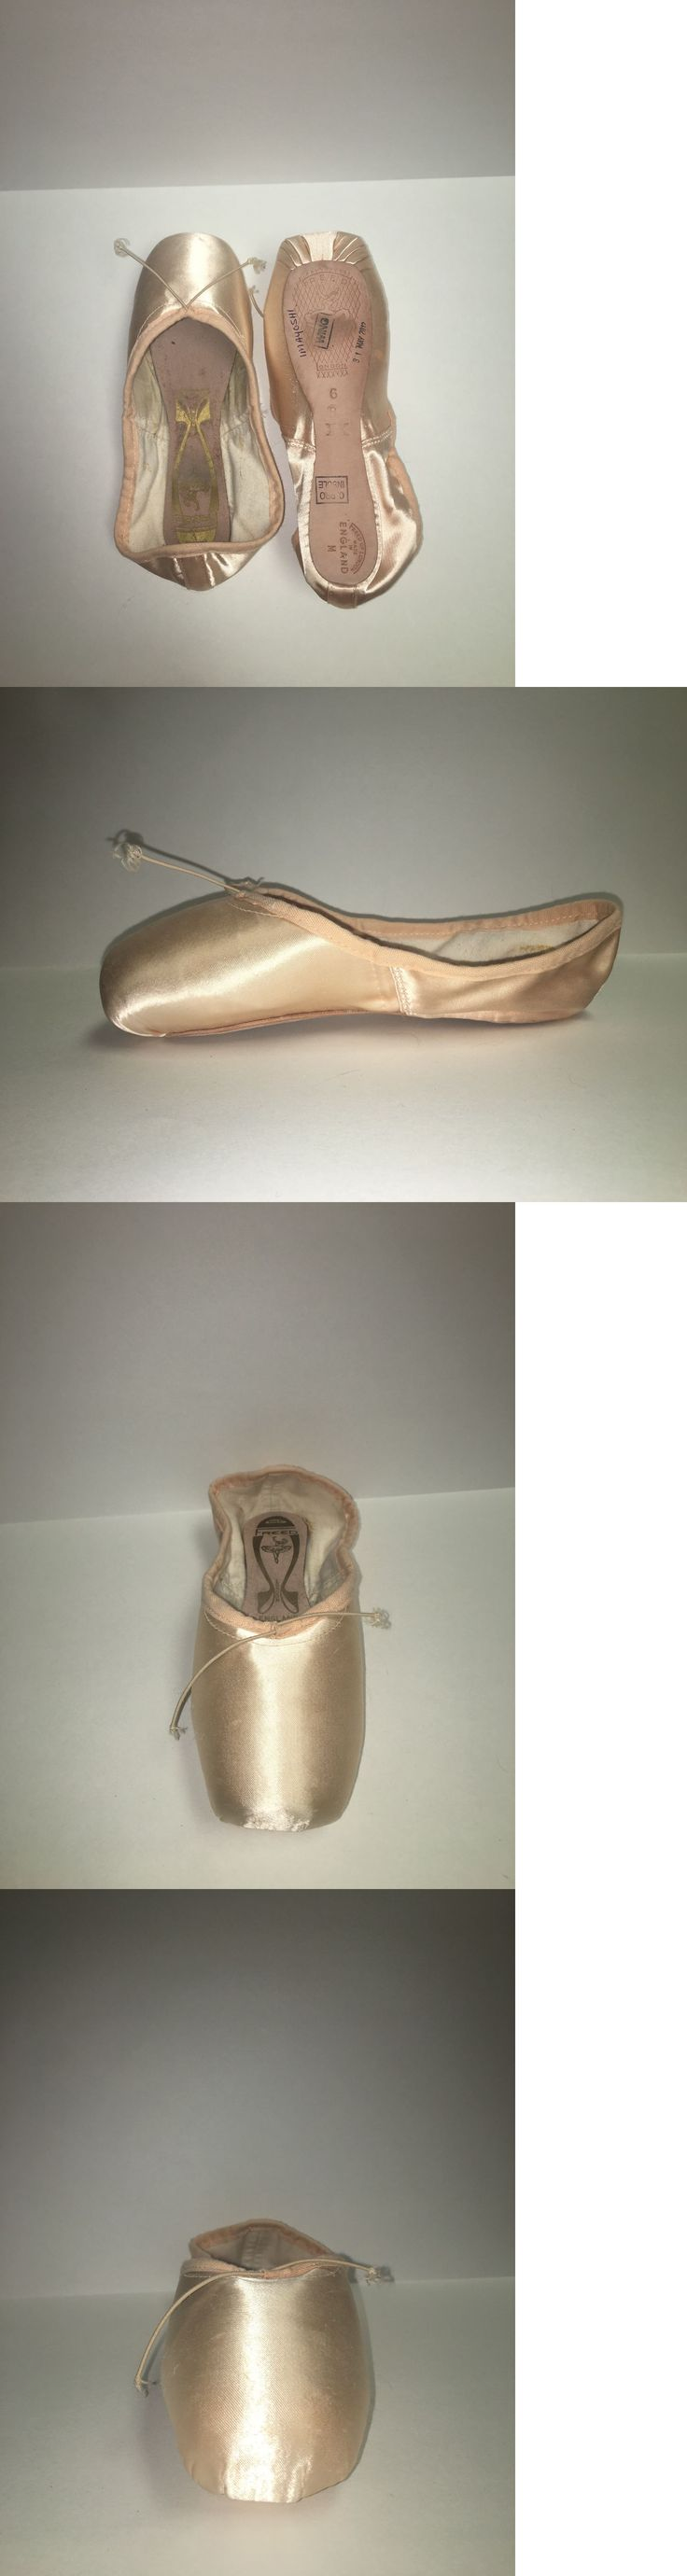 Ballet 150663: Custom Freed Classic Pro Pointe Shoe | 6Xx | B Maker | Wing -> BUY IT NOW ONLY: $50.99 on eBay!